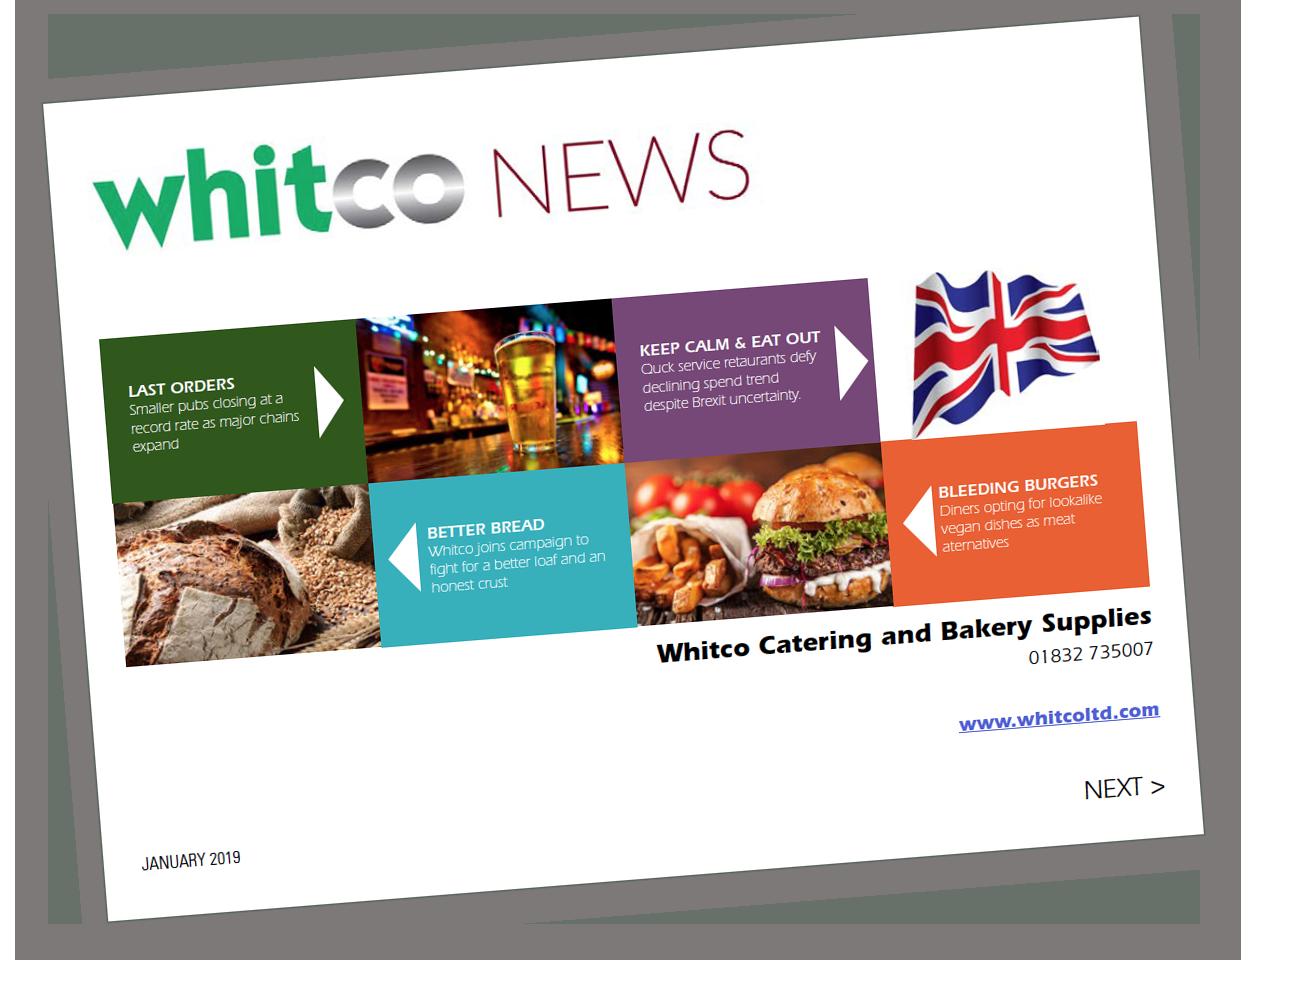 Whitco News Cover